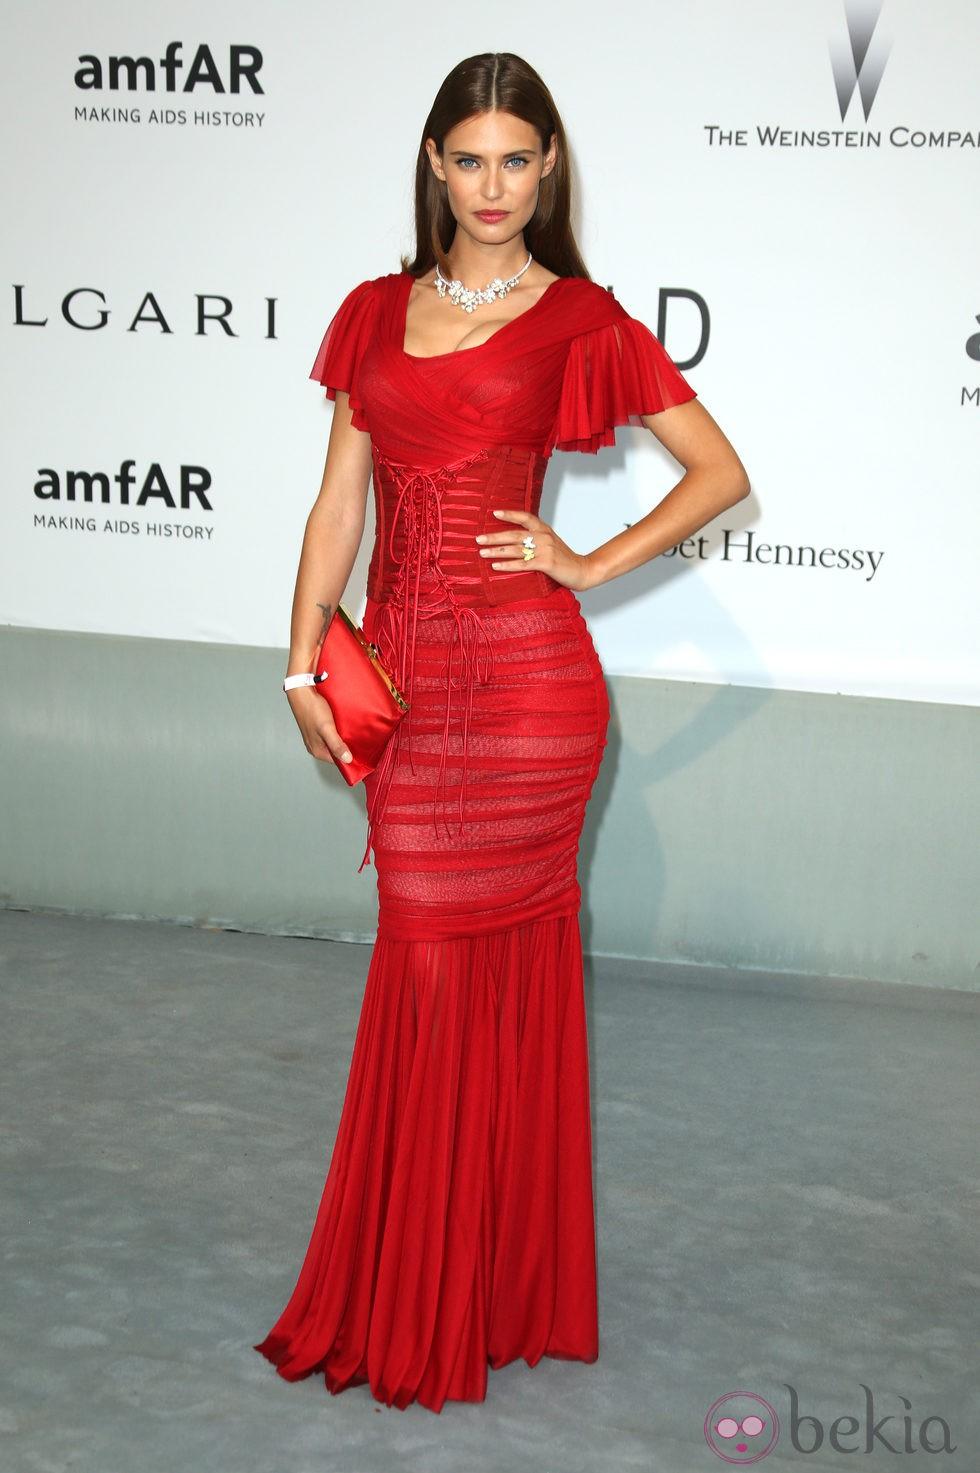 Bianca Balti en la gala amfAR del Festival de Cannes 2014